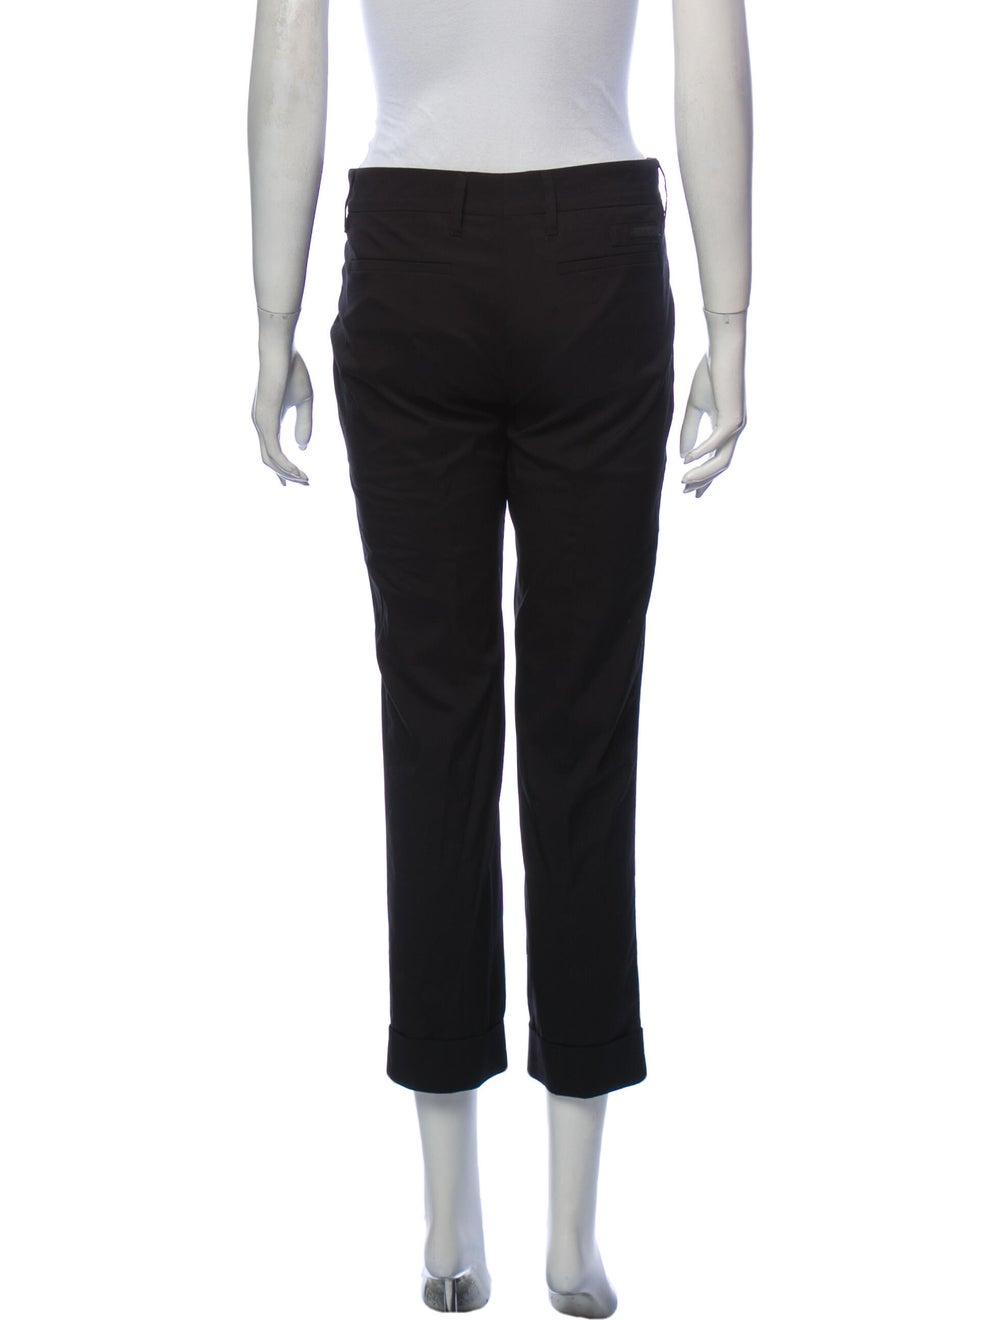 Prada Straight Leg Pants Black - image 3